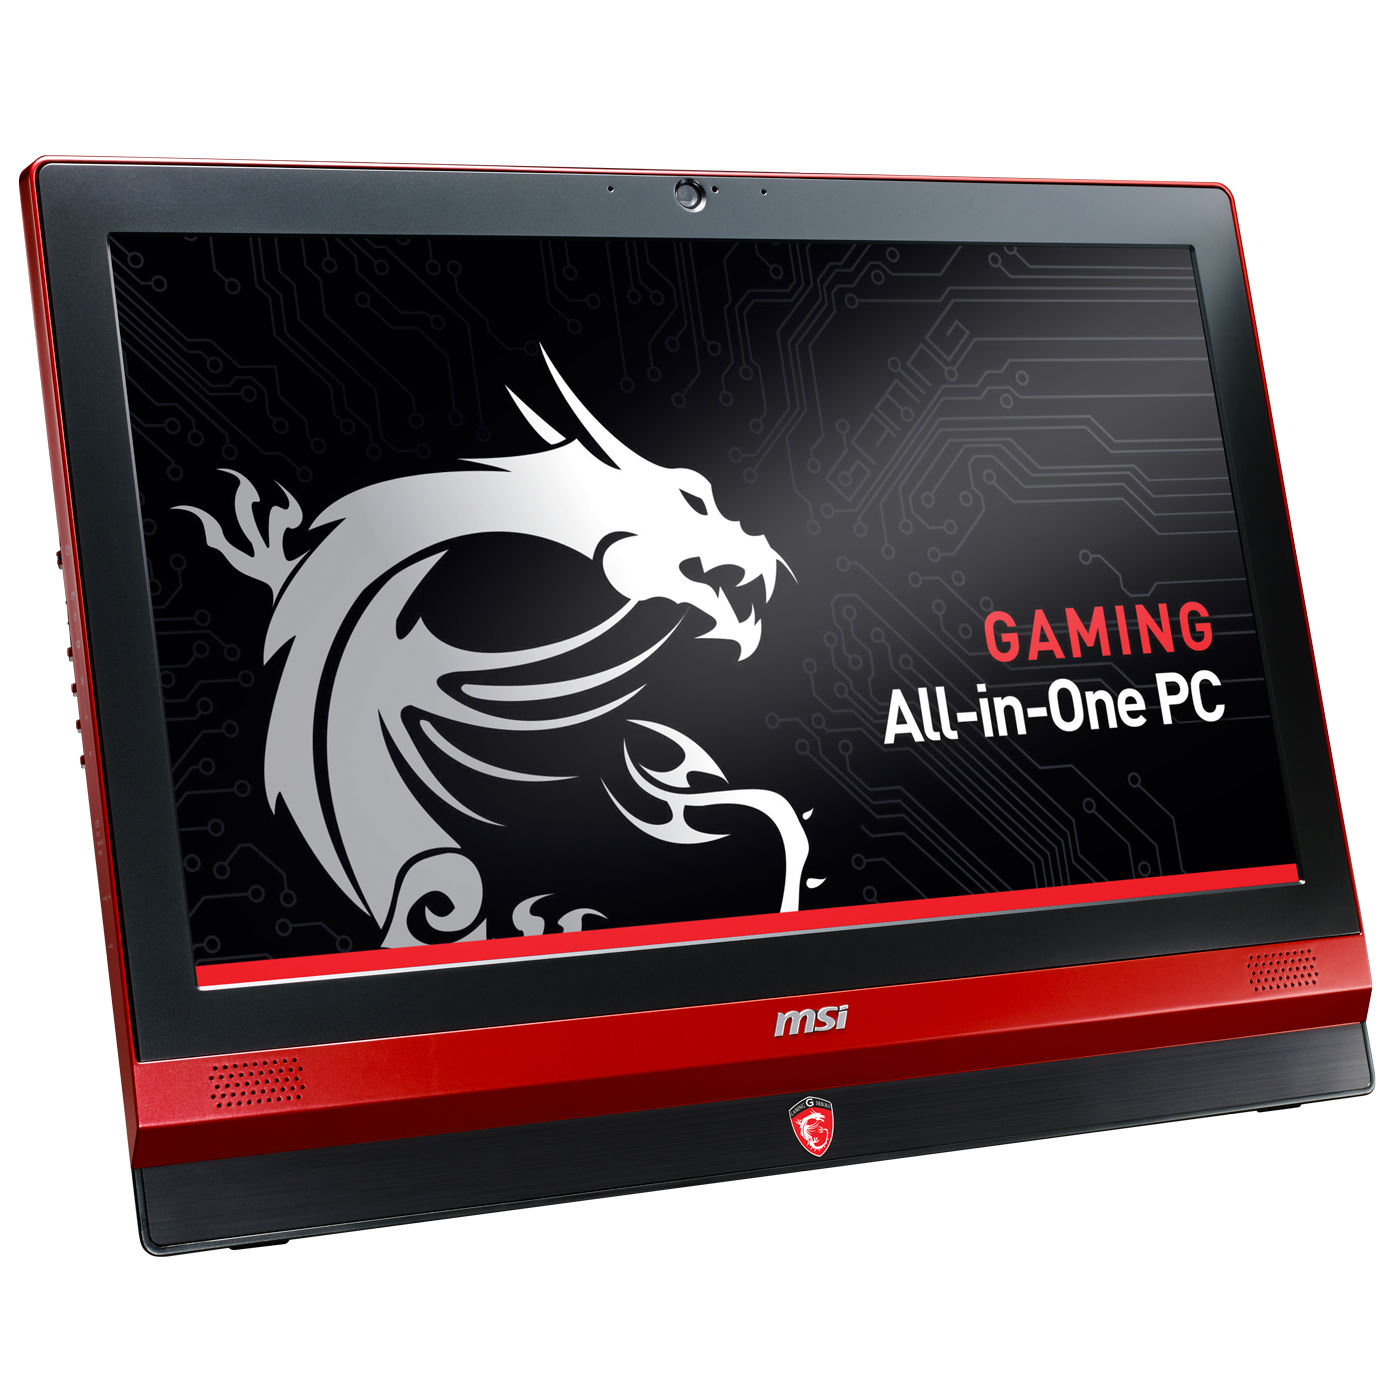 "PC de bureau MSI AG240 2PE-001XEU GAMING Intel Core i7-4700HQ 8 Go SSD 128 Go + HDD 1 To LED 23.6"" NVIDIA GeForce GTX 860M Graveur DVD Wi-Fi AC/Bluetooth Webcam (Garantie constructeur 2 ans)"